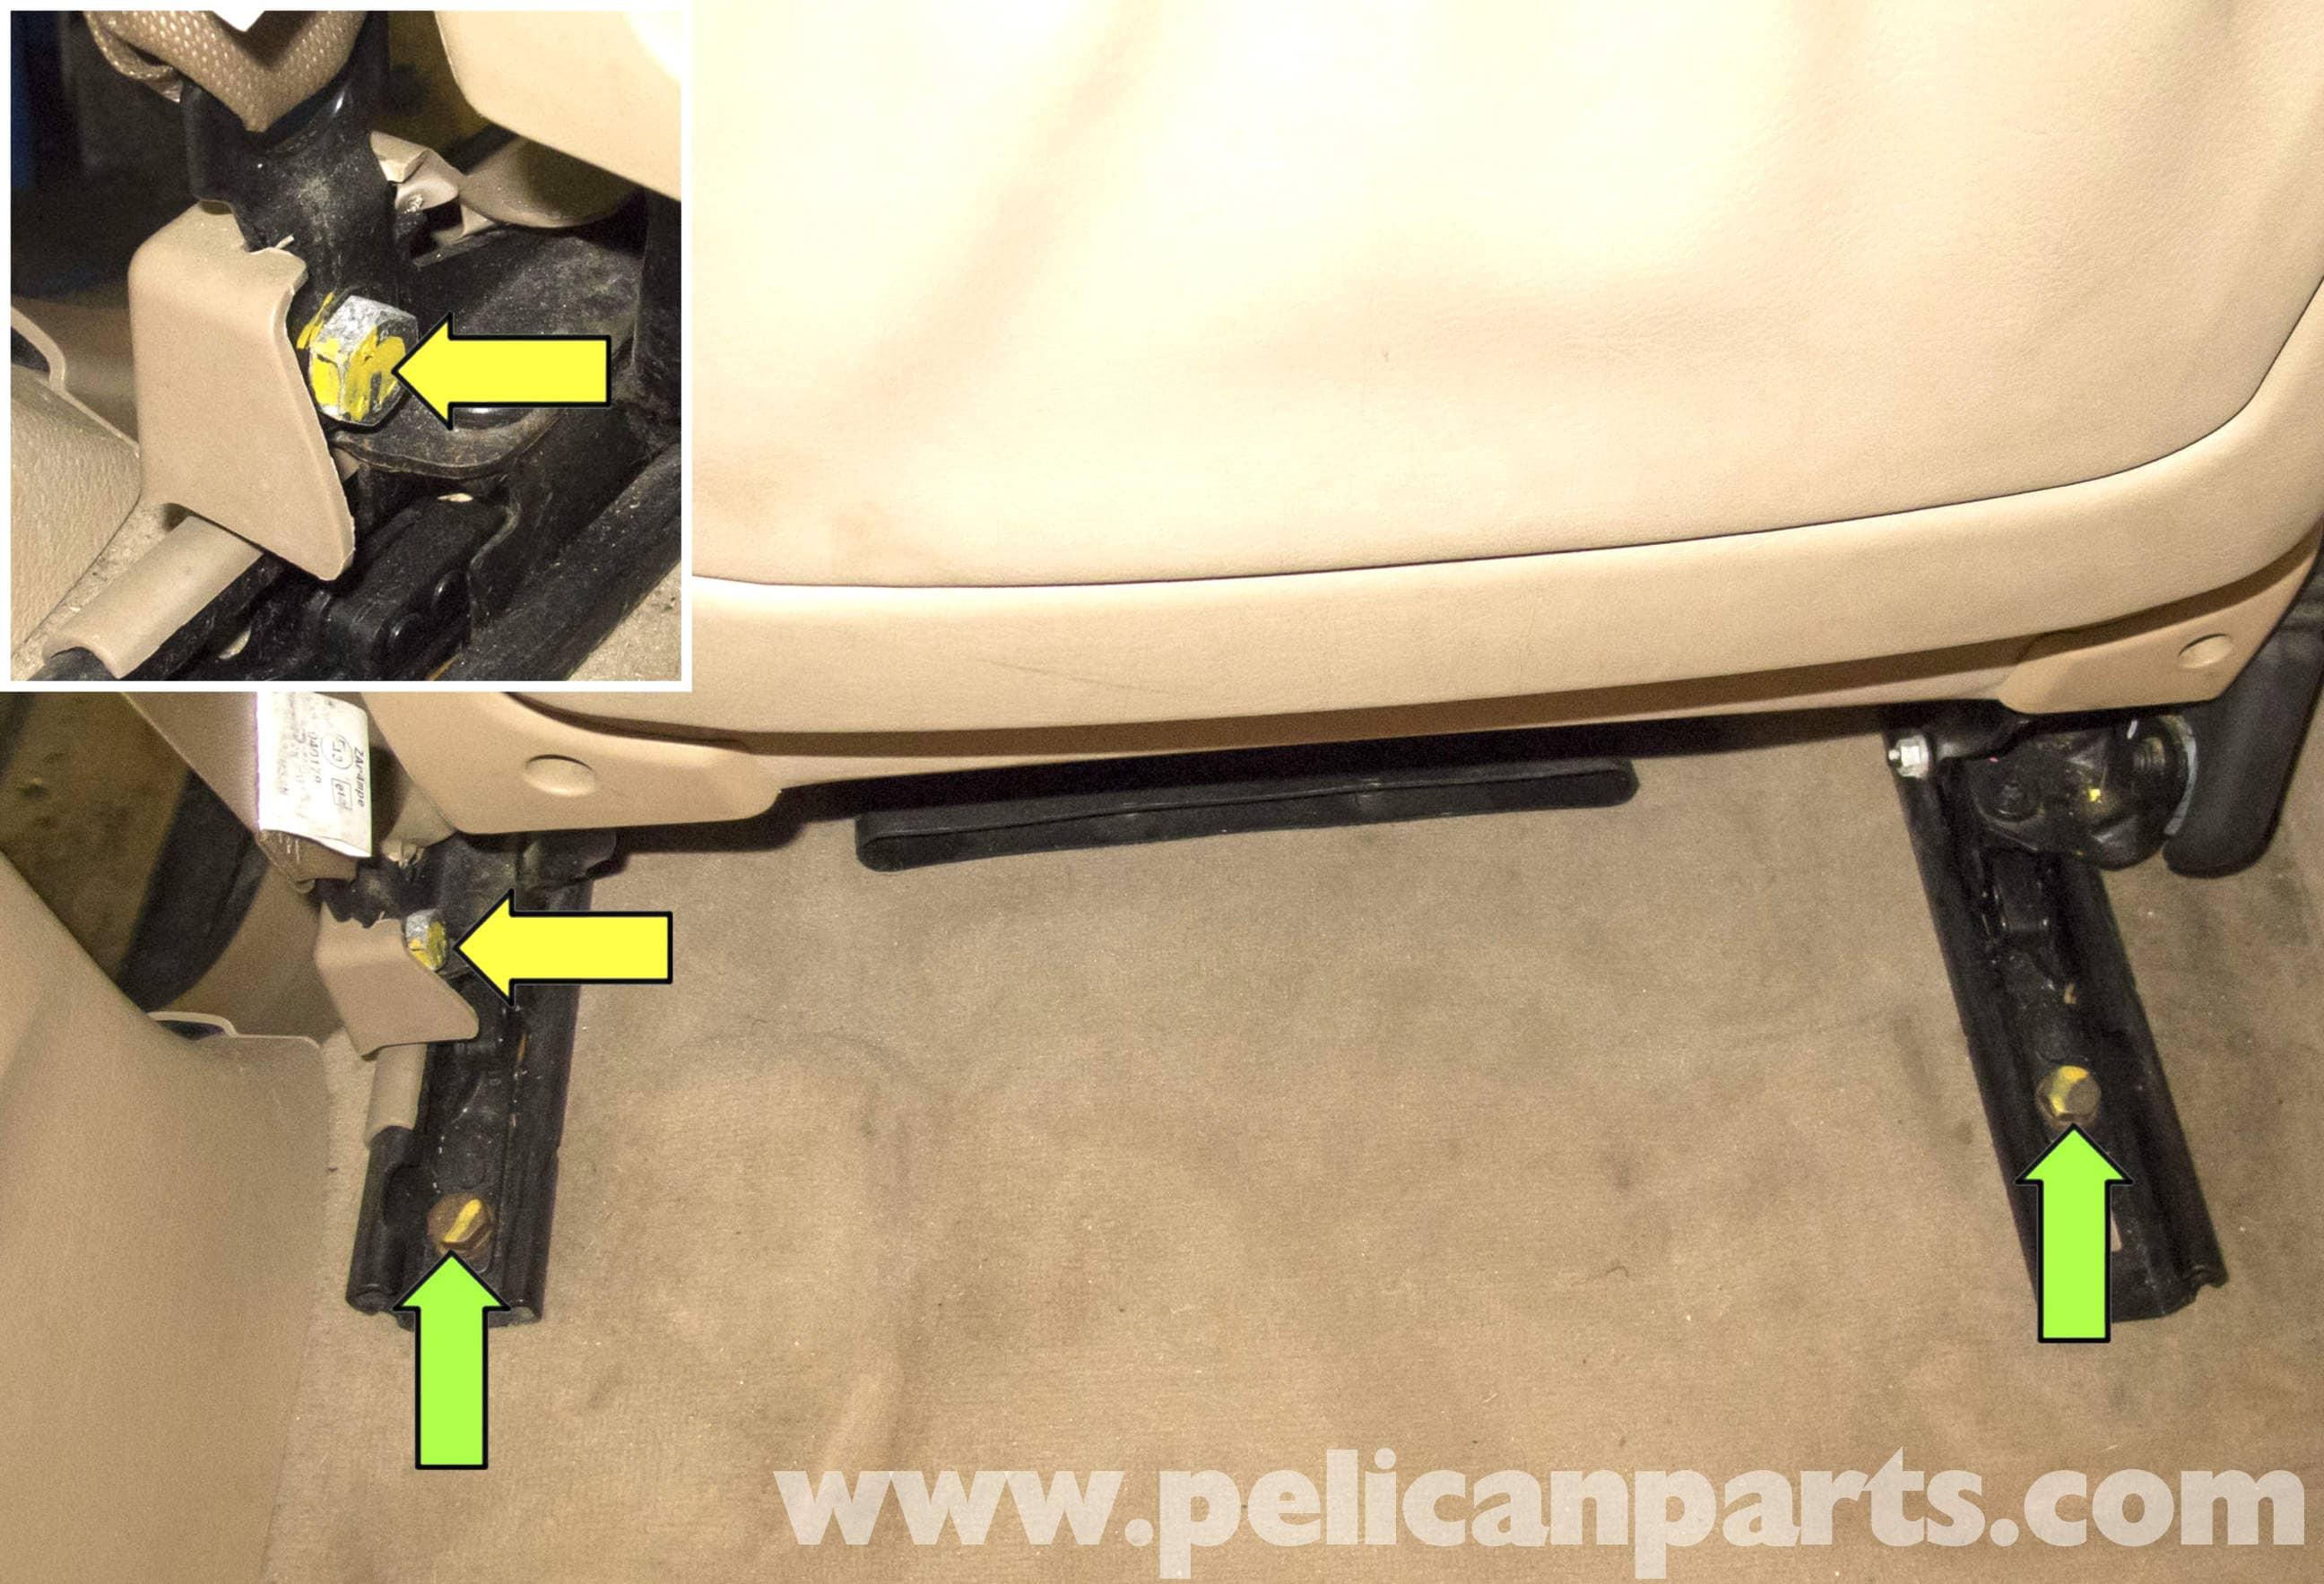 Bmw X5 Seat Removal E53 2000 2006 Pelican Parts Diy Maintenance Article